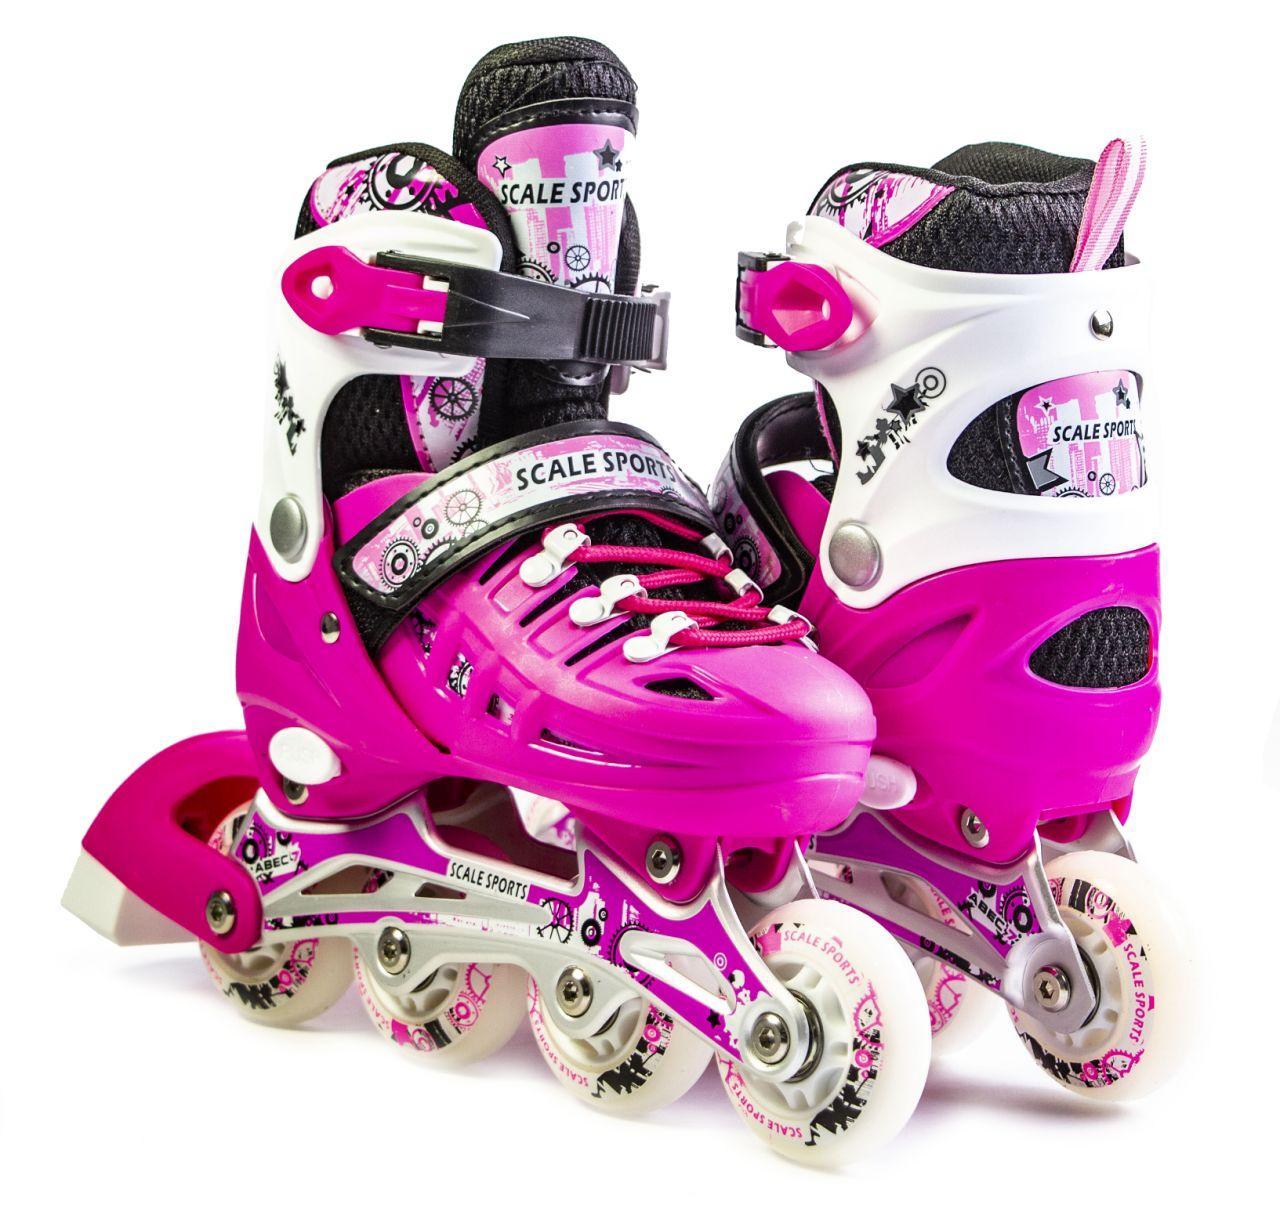 Ролики Scale Sports раздвижные  Pink размер 38-41